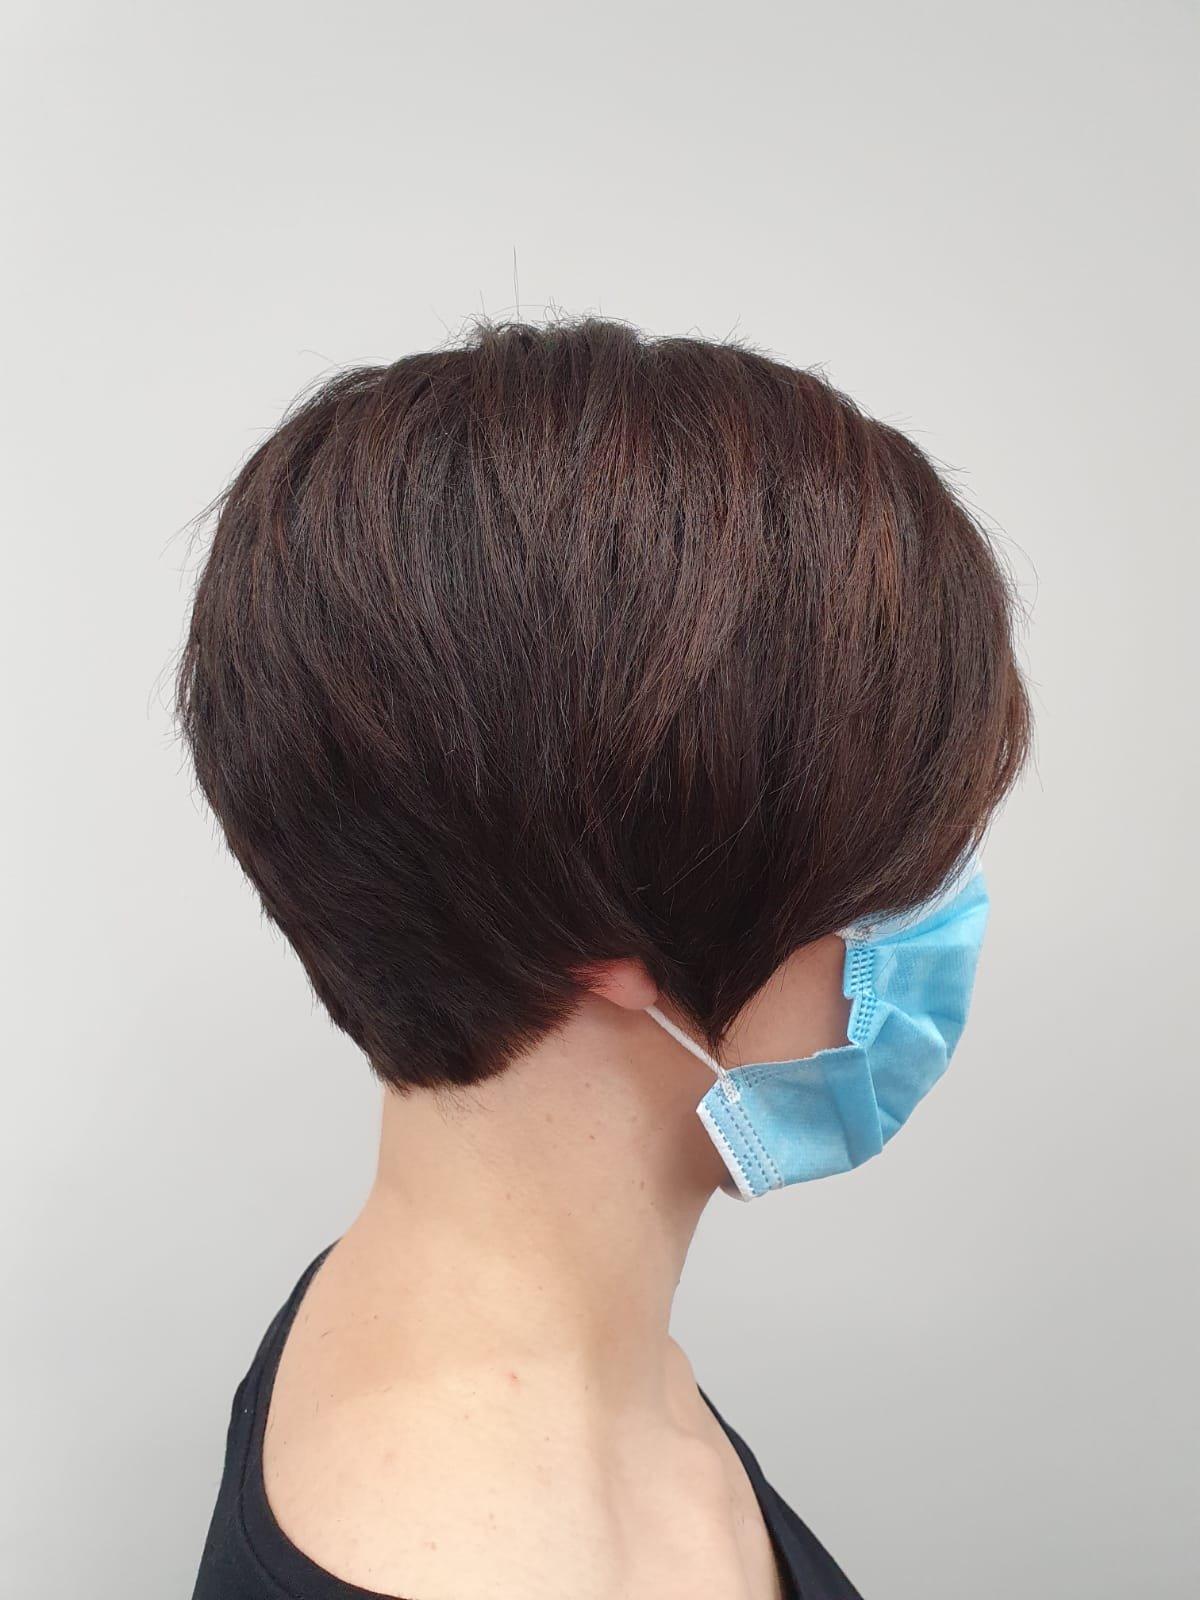 half price hair cuts, top hair salon in woking - hairlab hairdressers, woking